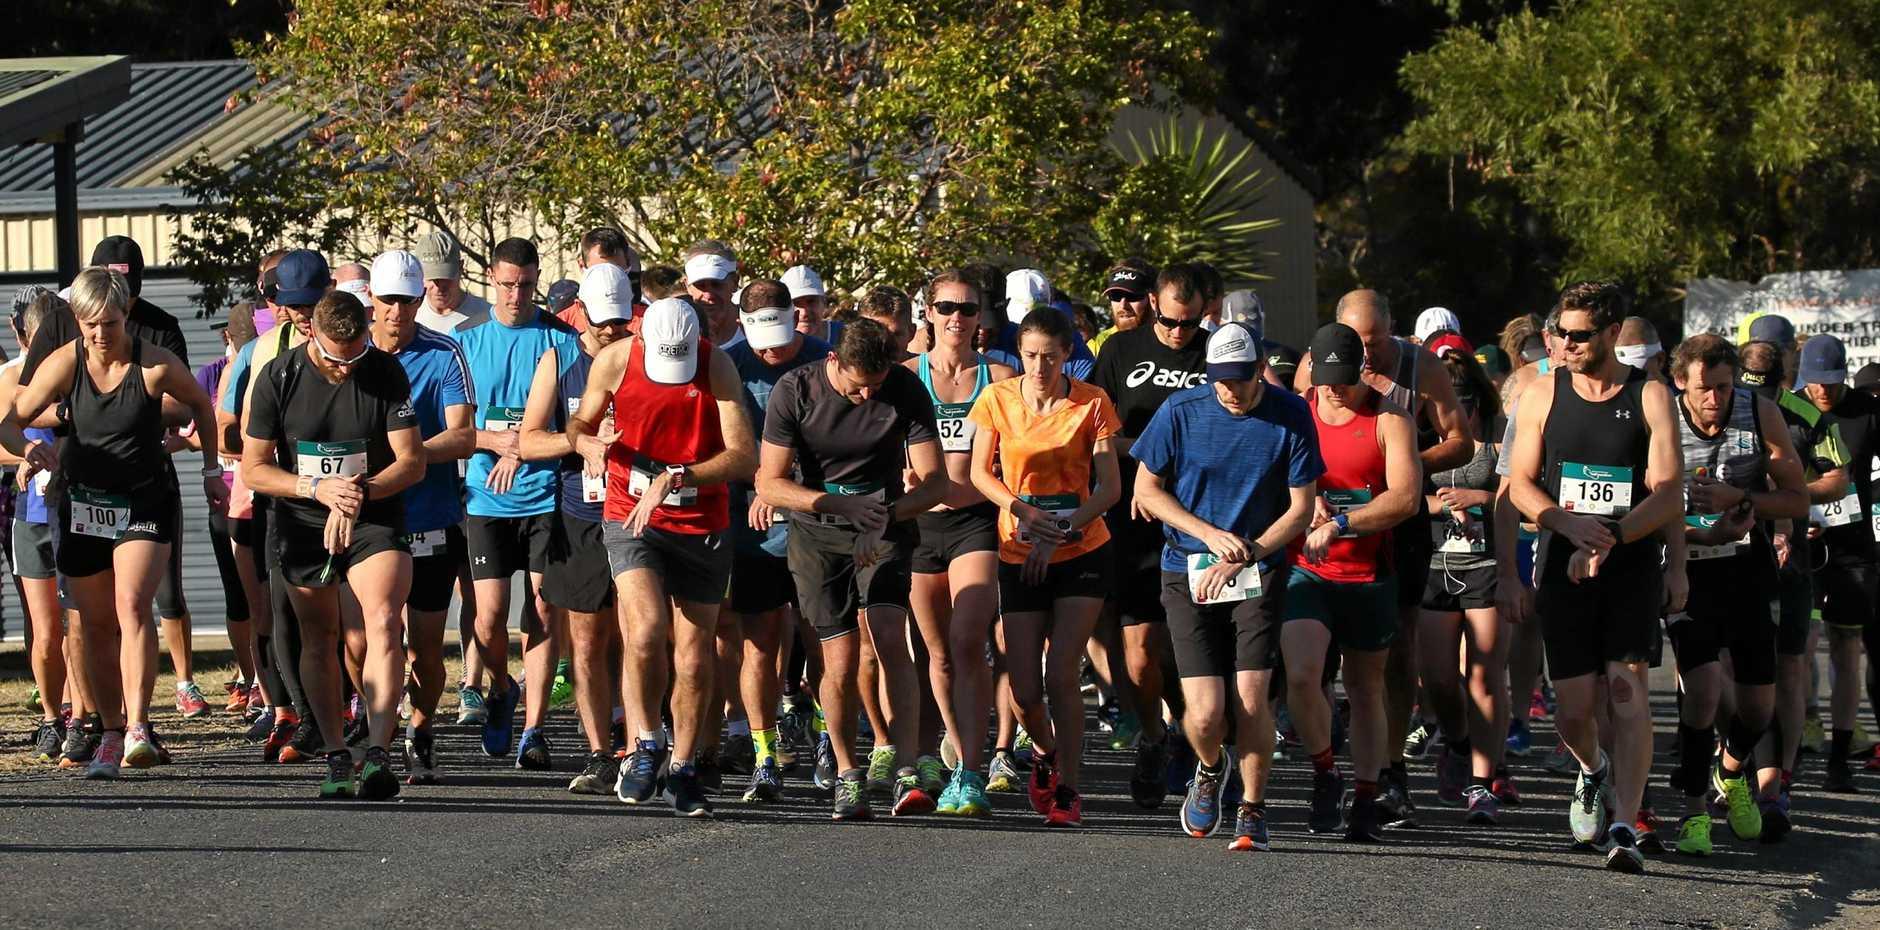 The Bendigo Bank Coffs Harbour Running Festival returns for its eighth year in September.